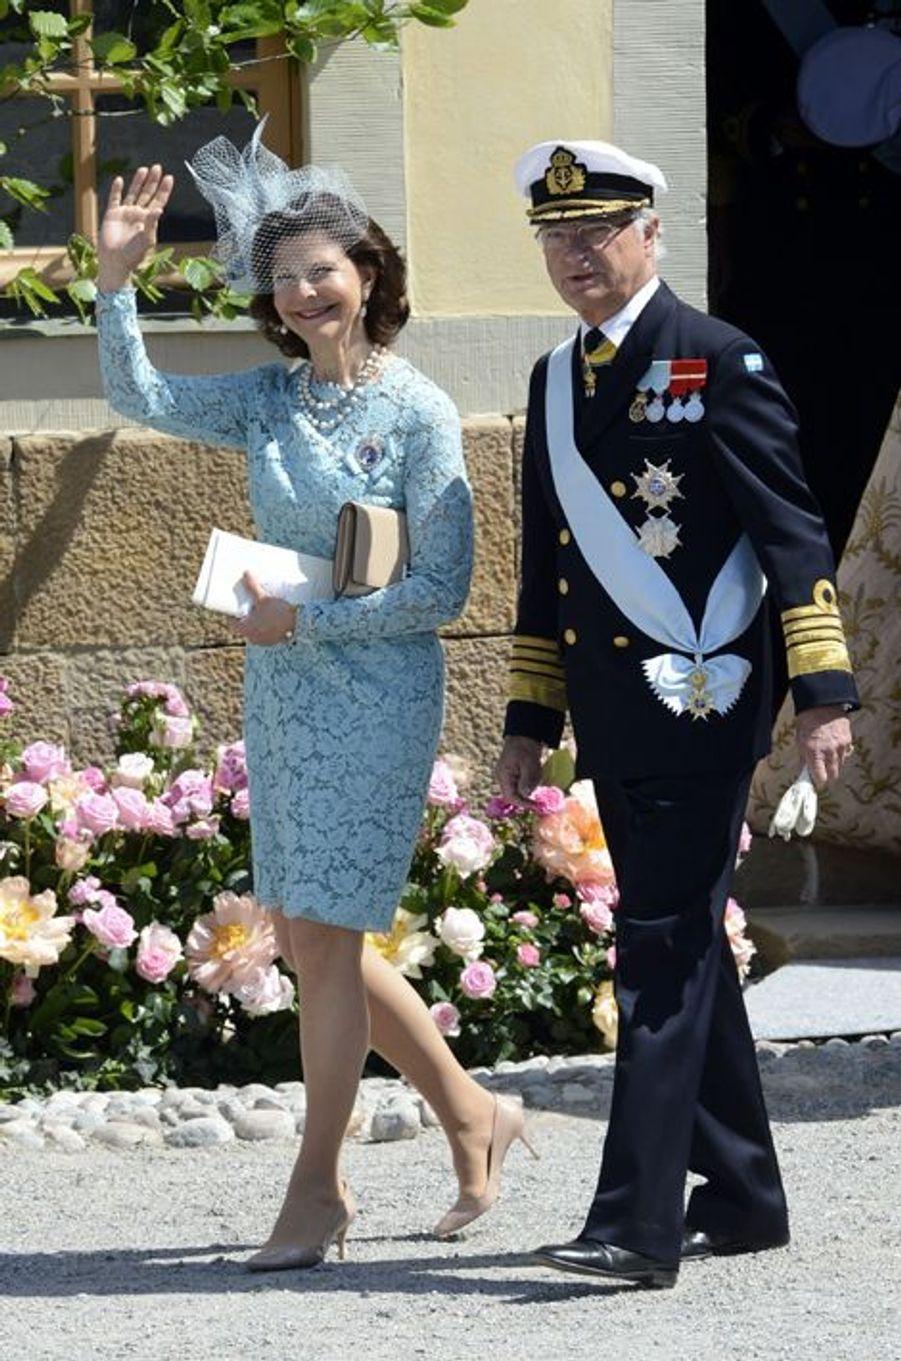 La reine Silvia et le roi Carl XVI Gustaf